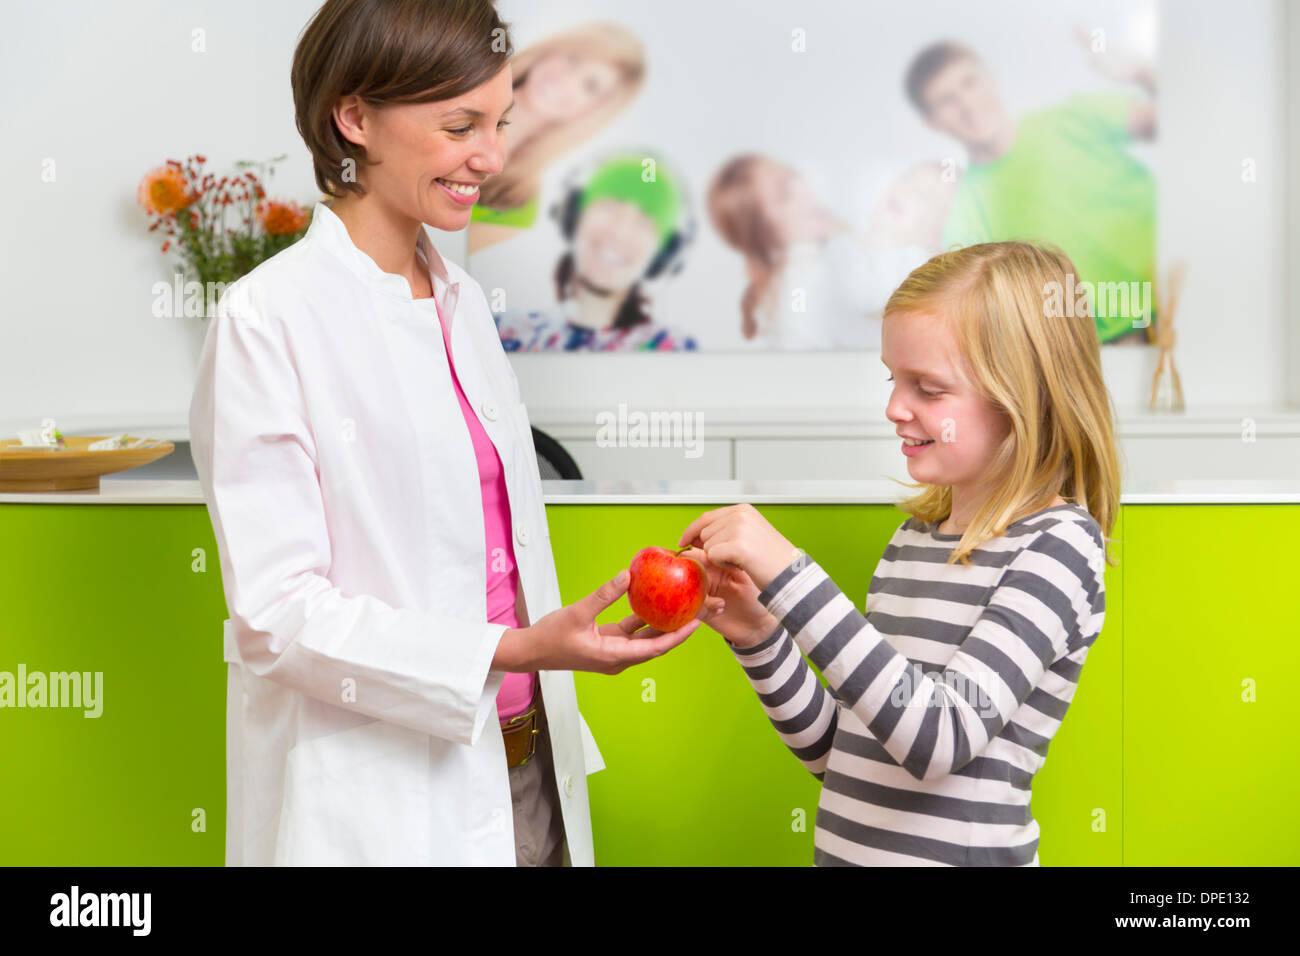 Dentist giving girl apple in dental reception - Stock Image